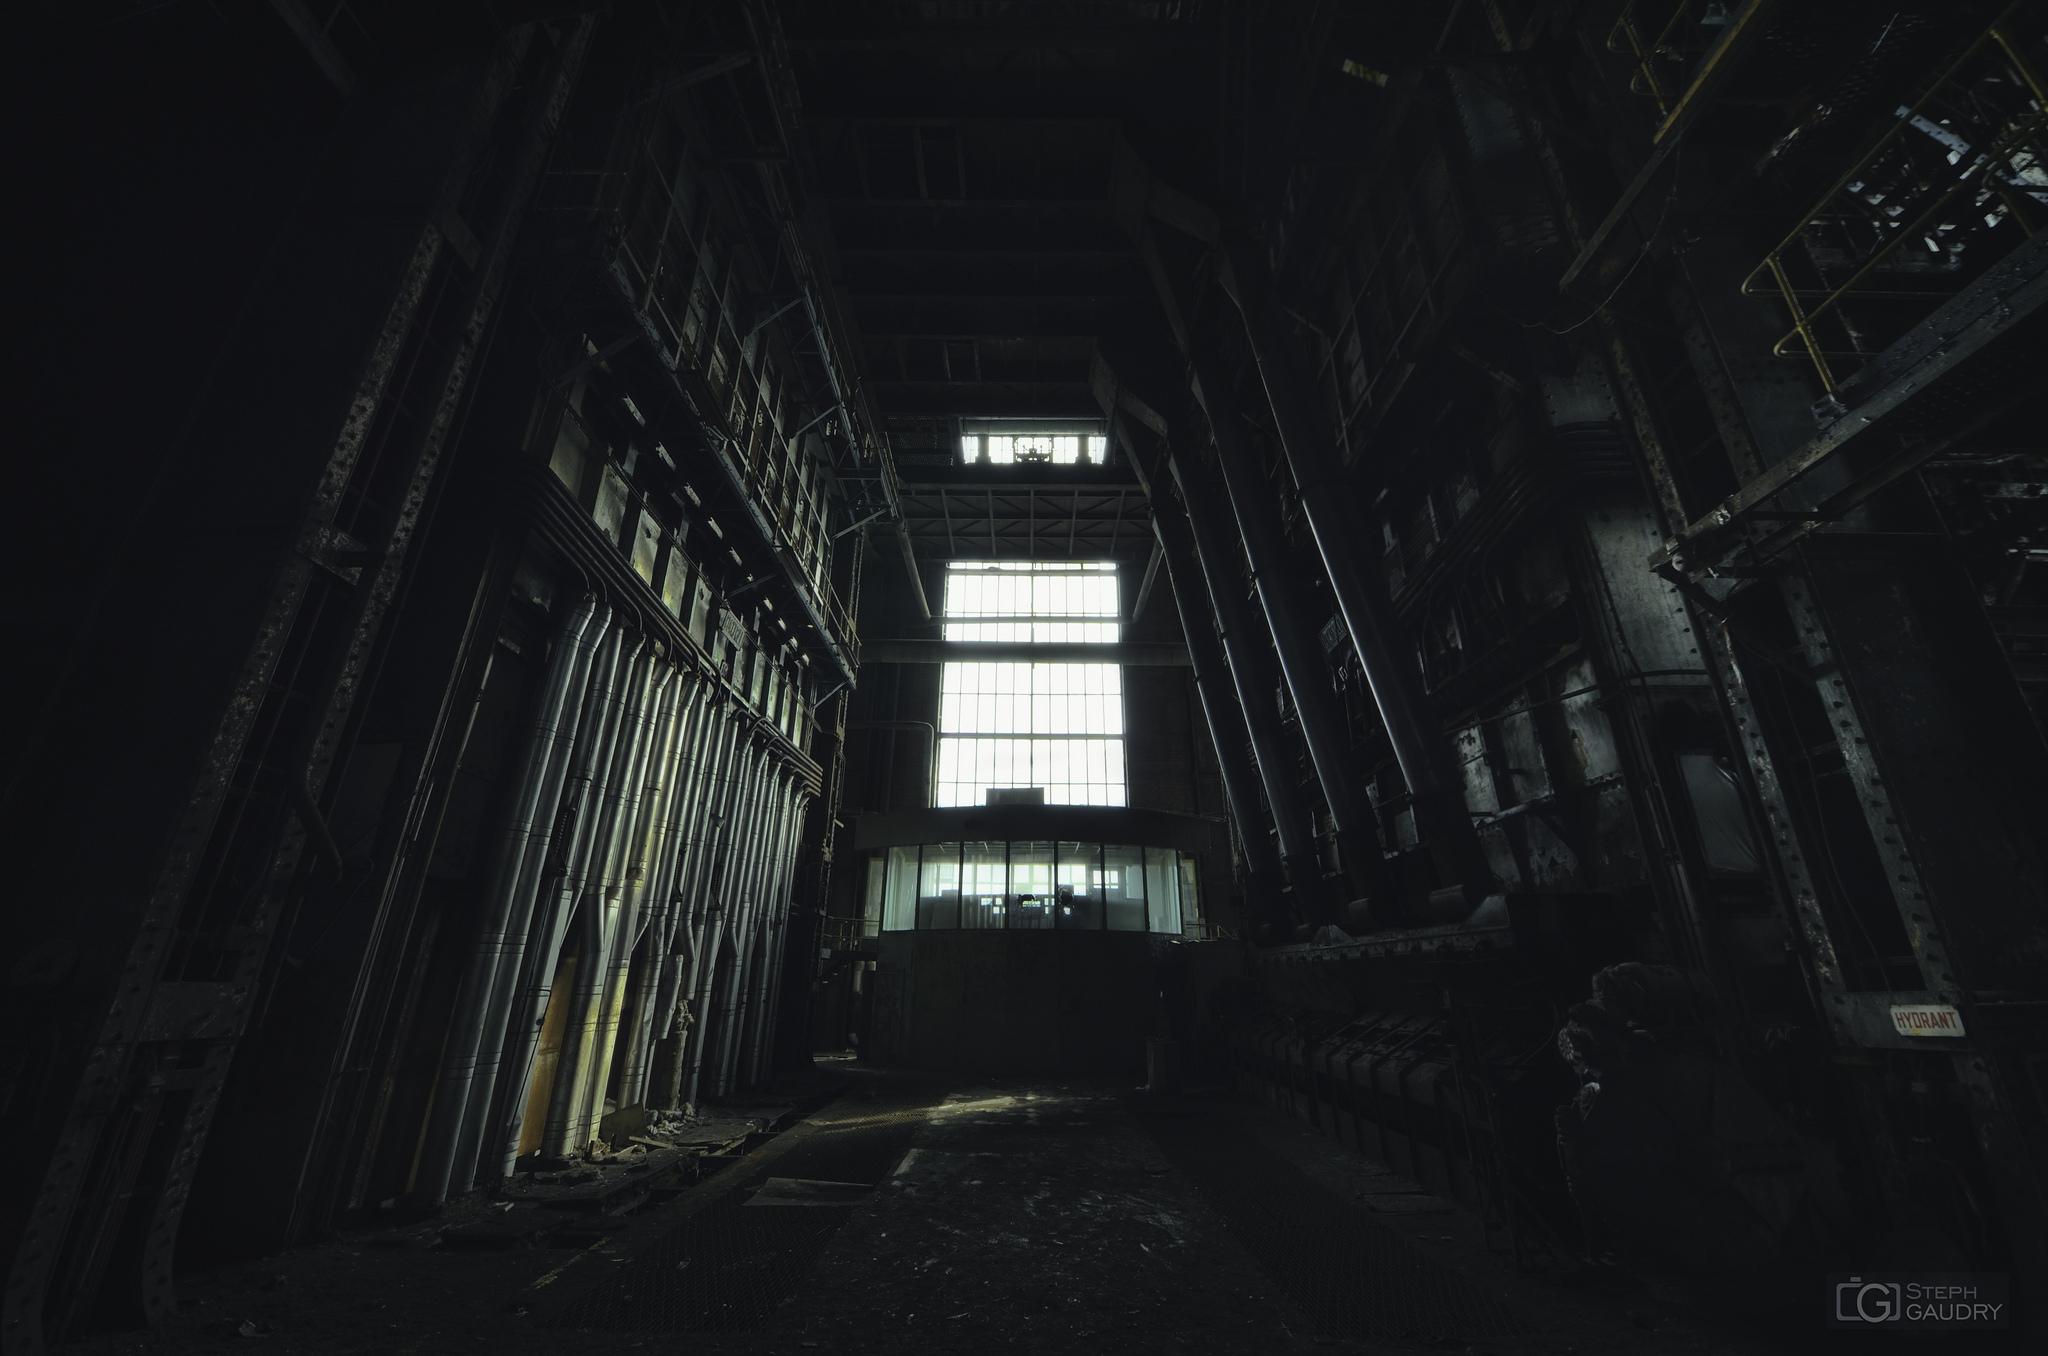 ECVB, alone in the dark [Cliquez pour lancer le diaporama]